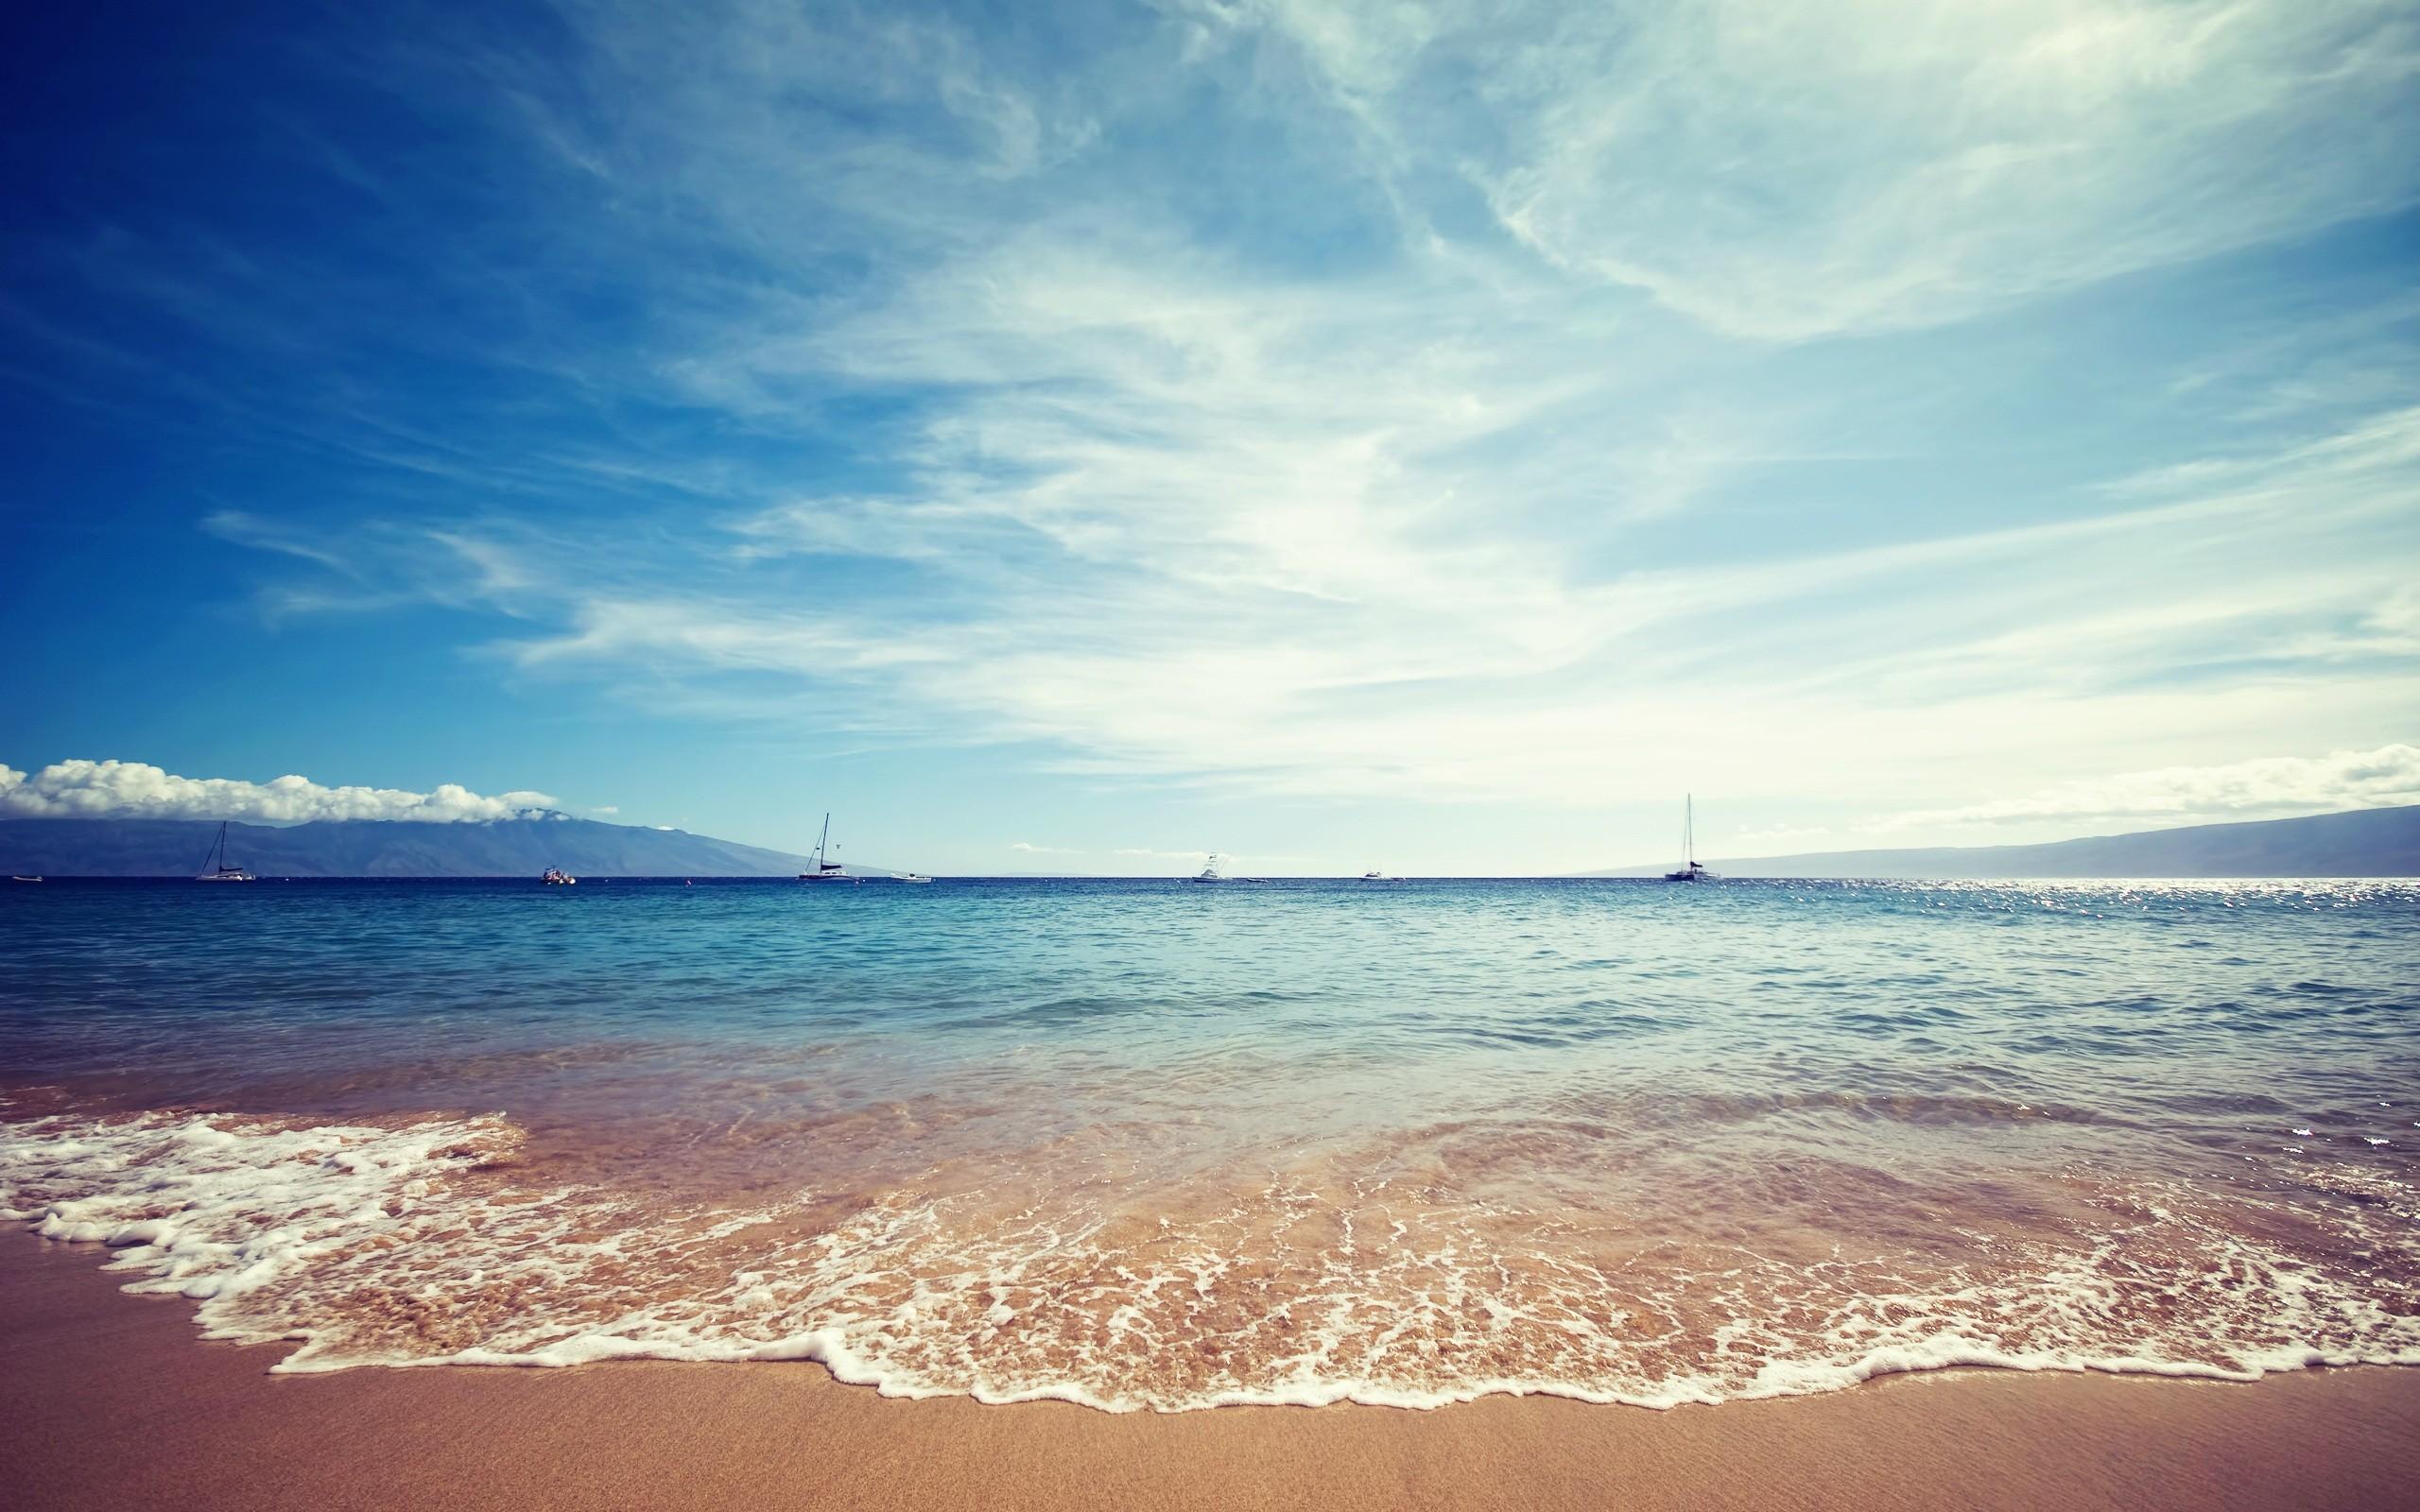 Ocean beach boats seascapes wallpaper 2560x1600 11534 2560x1600